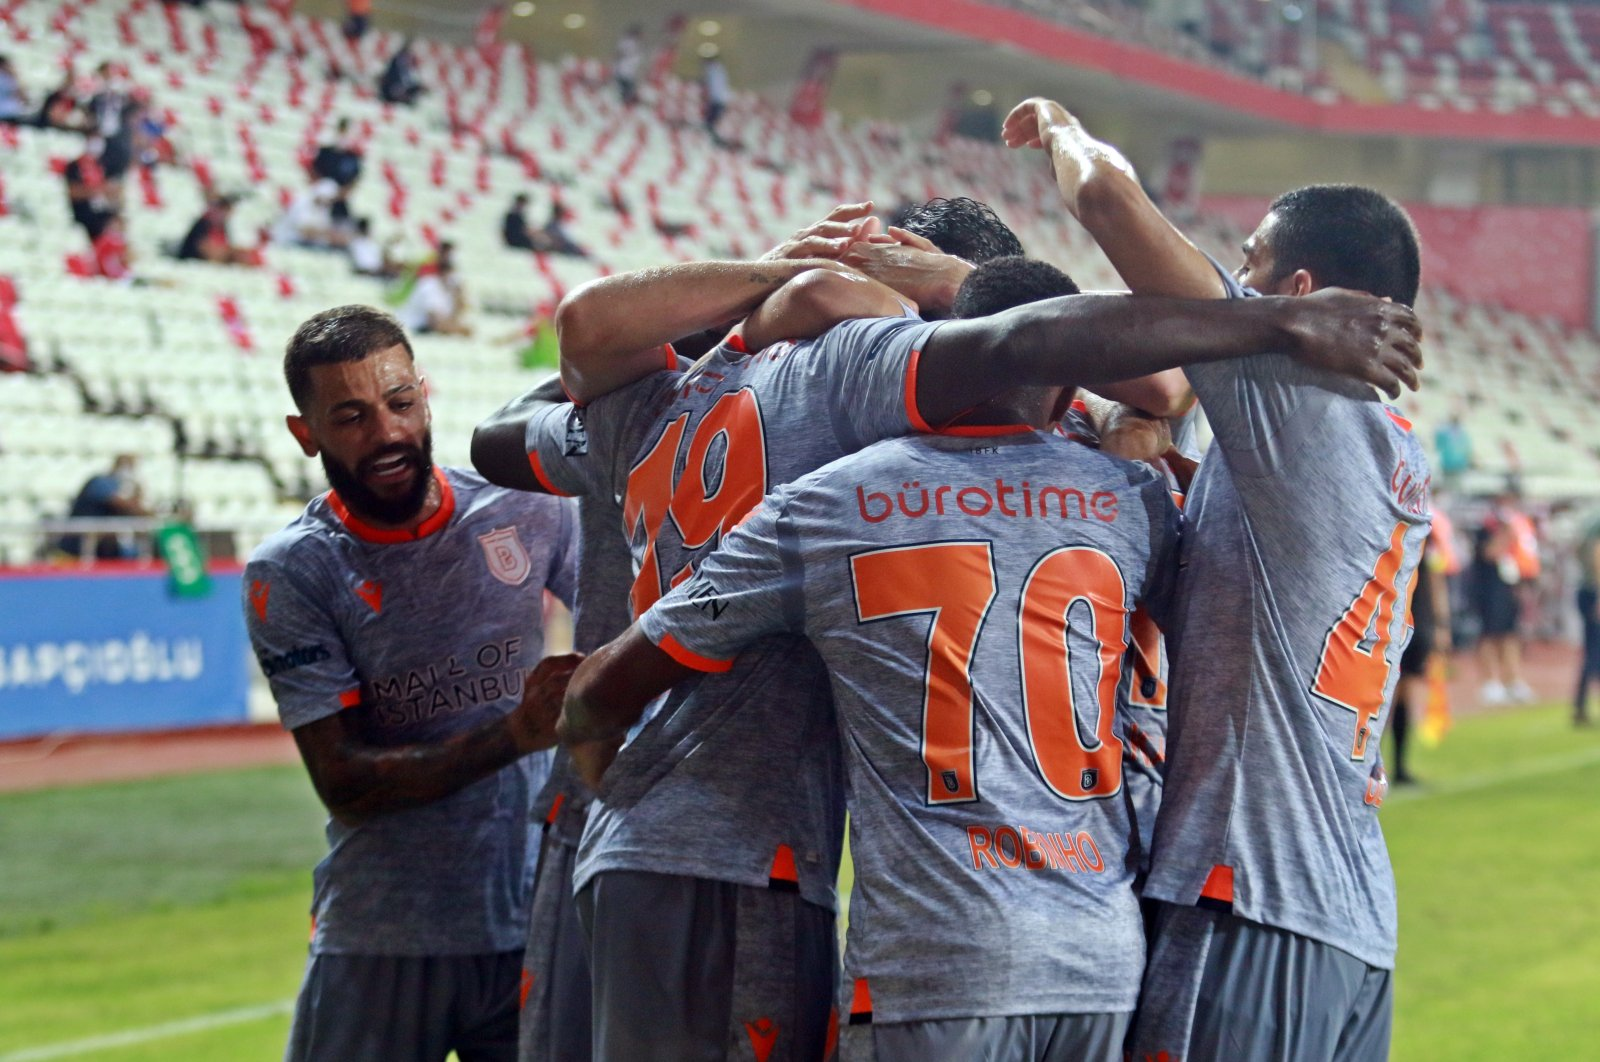 Başakşehir players celebrate victory against Antalyaspor, in Antalya, Turkey, July 4, 2020. (İHA Photo)